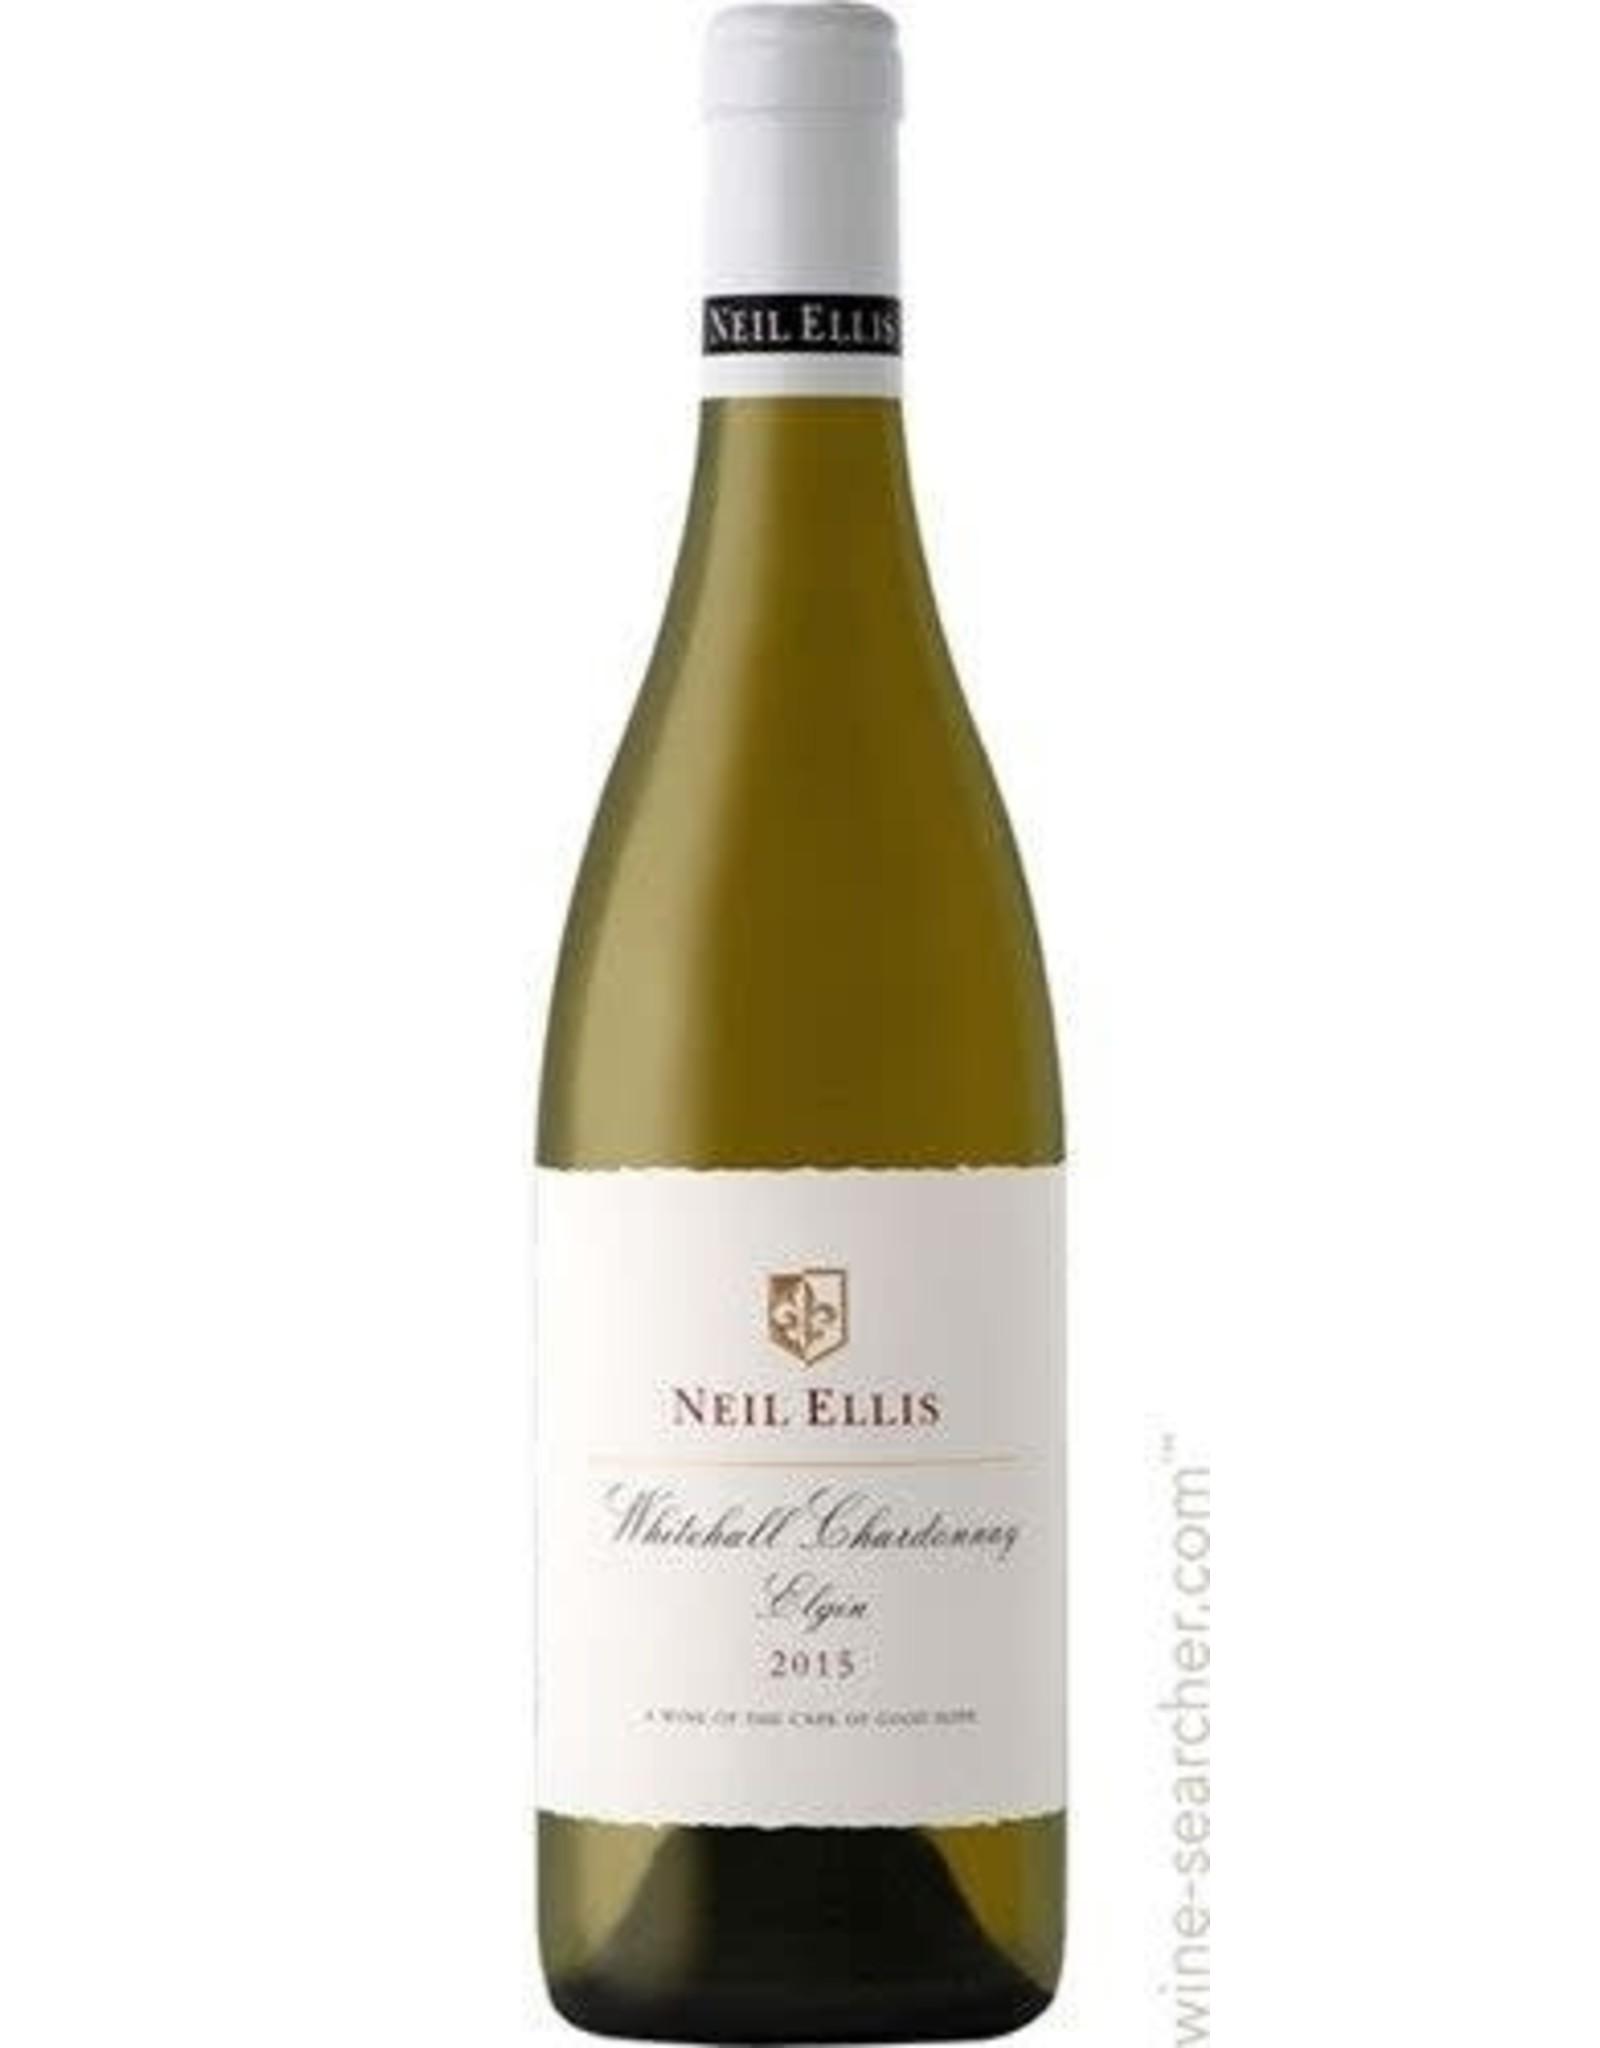 Neil Ellis Elgin Whitehall Chardonnay 2018